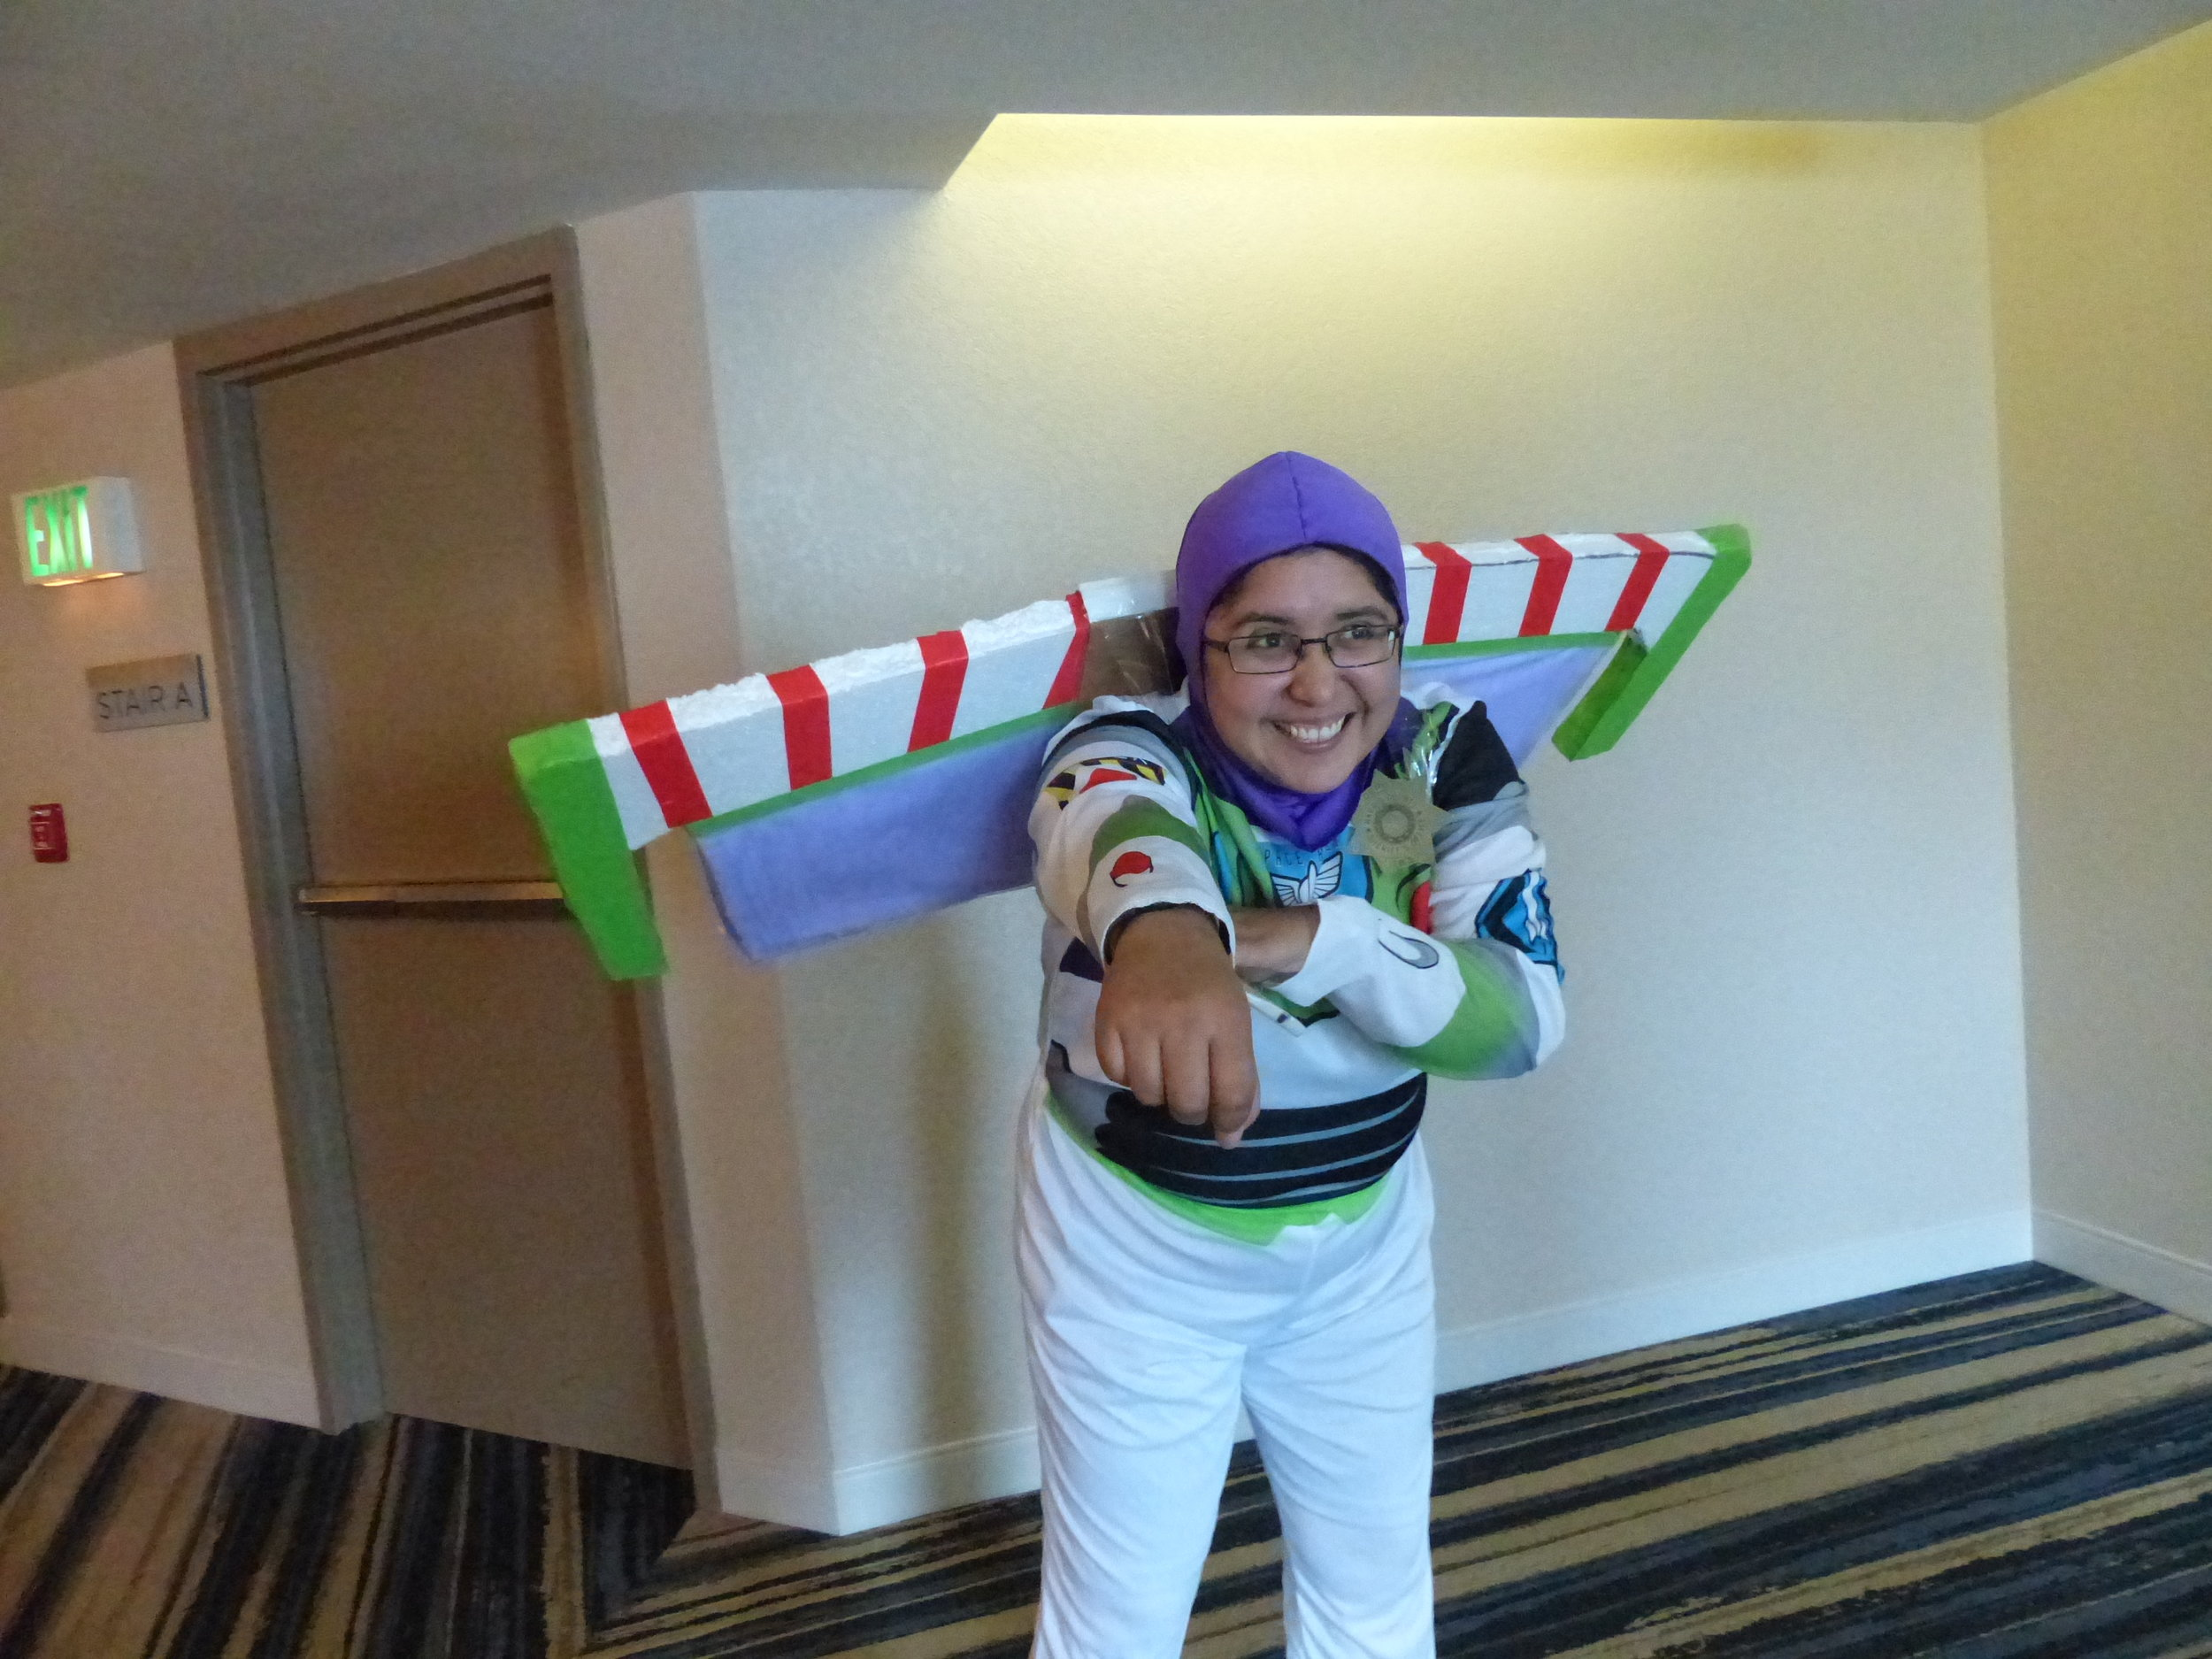 Rocio dressed as Buzz Lightyear for the Biochemistry Retreat costume contest (2016).